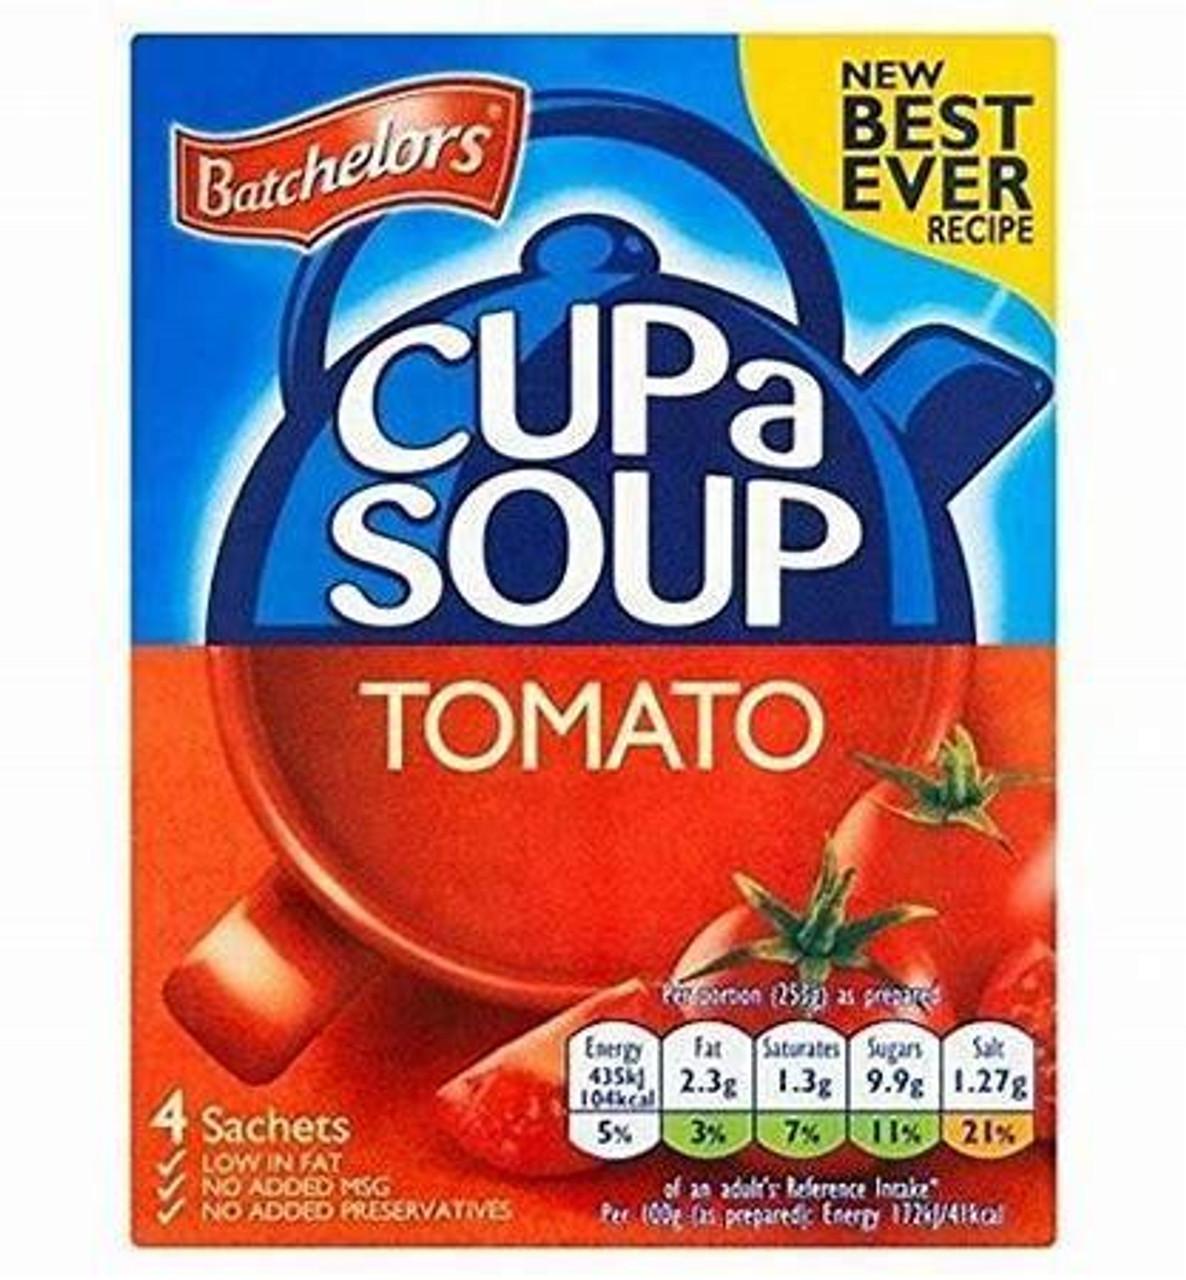 Batchelors Cup-A-Soup Tomato 4pk